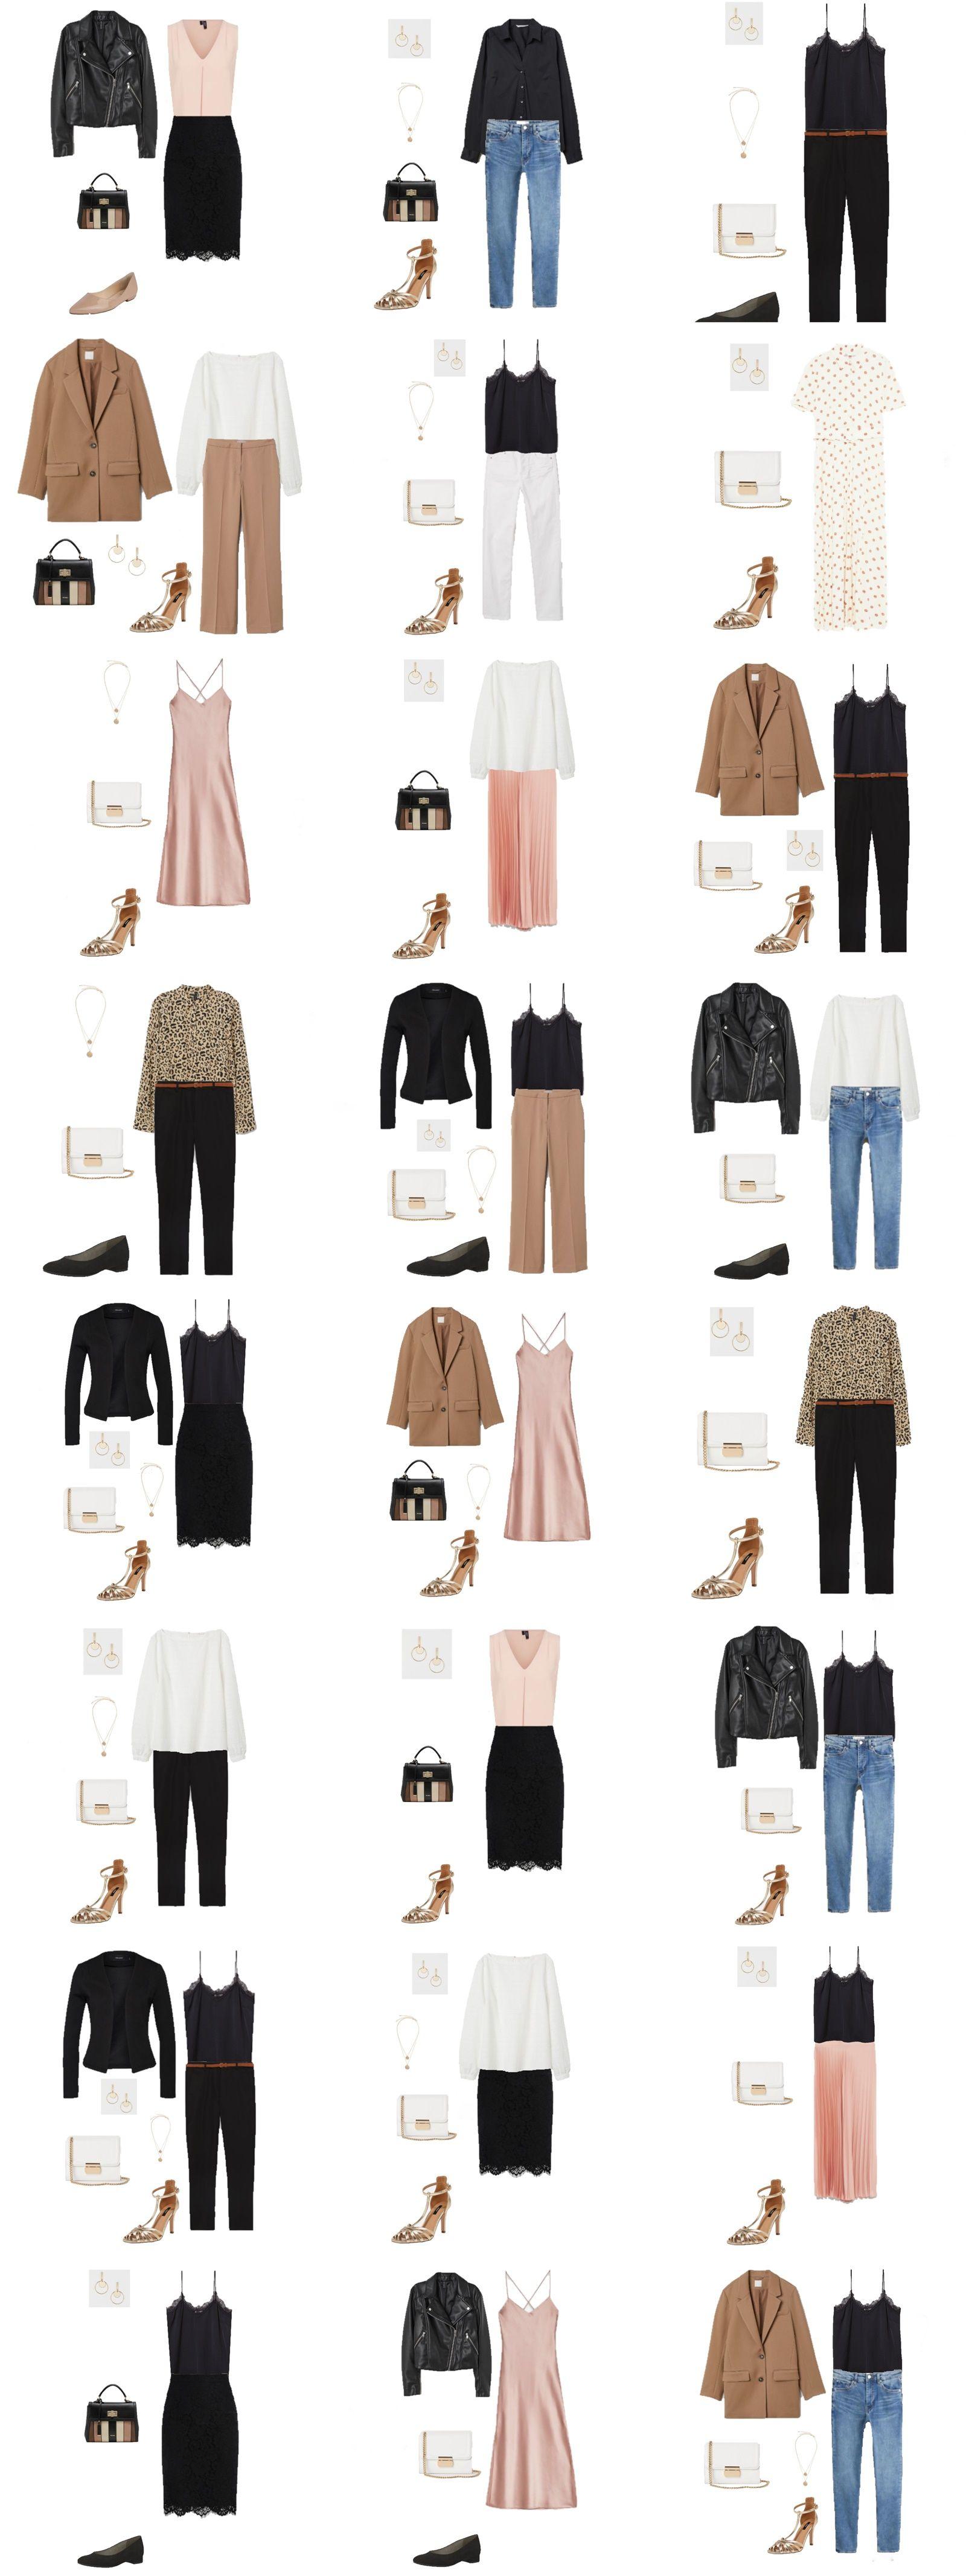 Frühlings Capsule Wardrobe - womenontrend #datenightoutfit